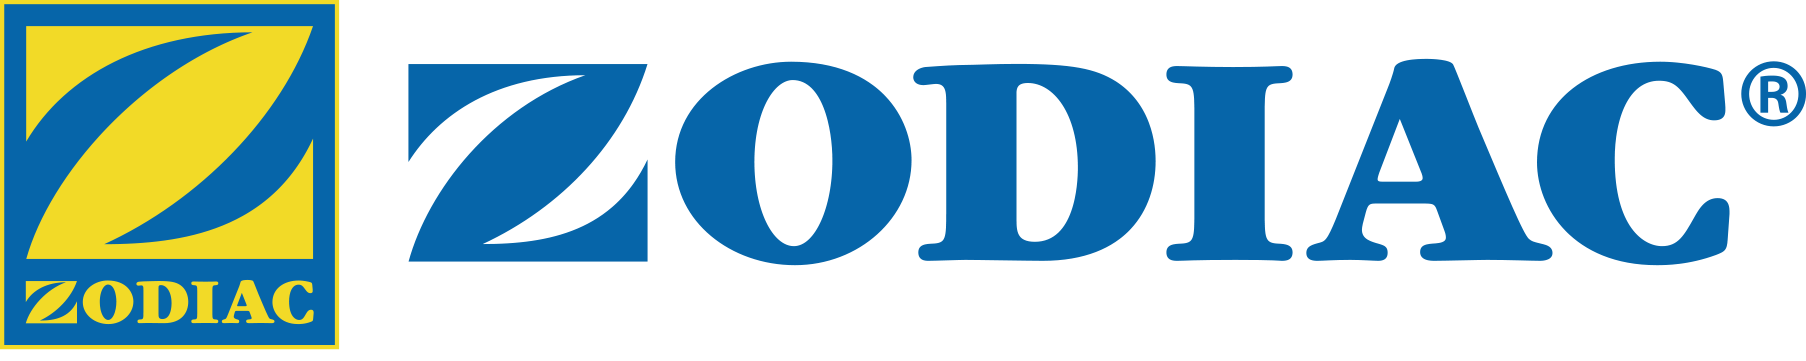 Zodiac a Fluidra Company